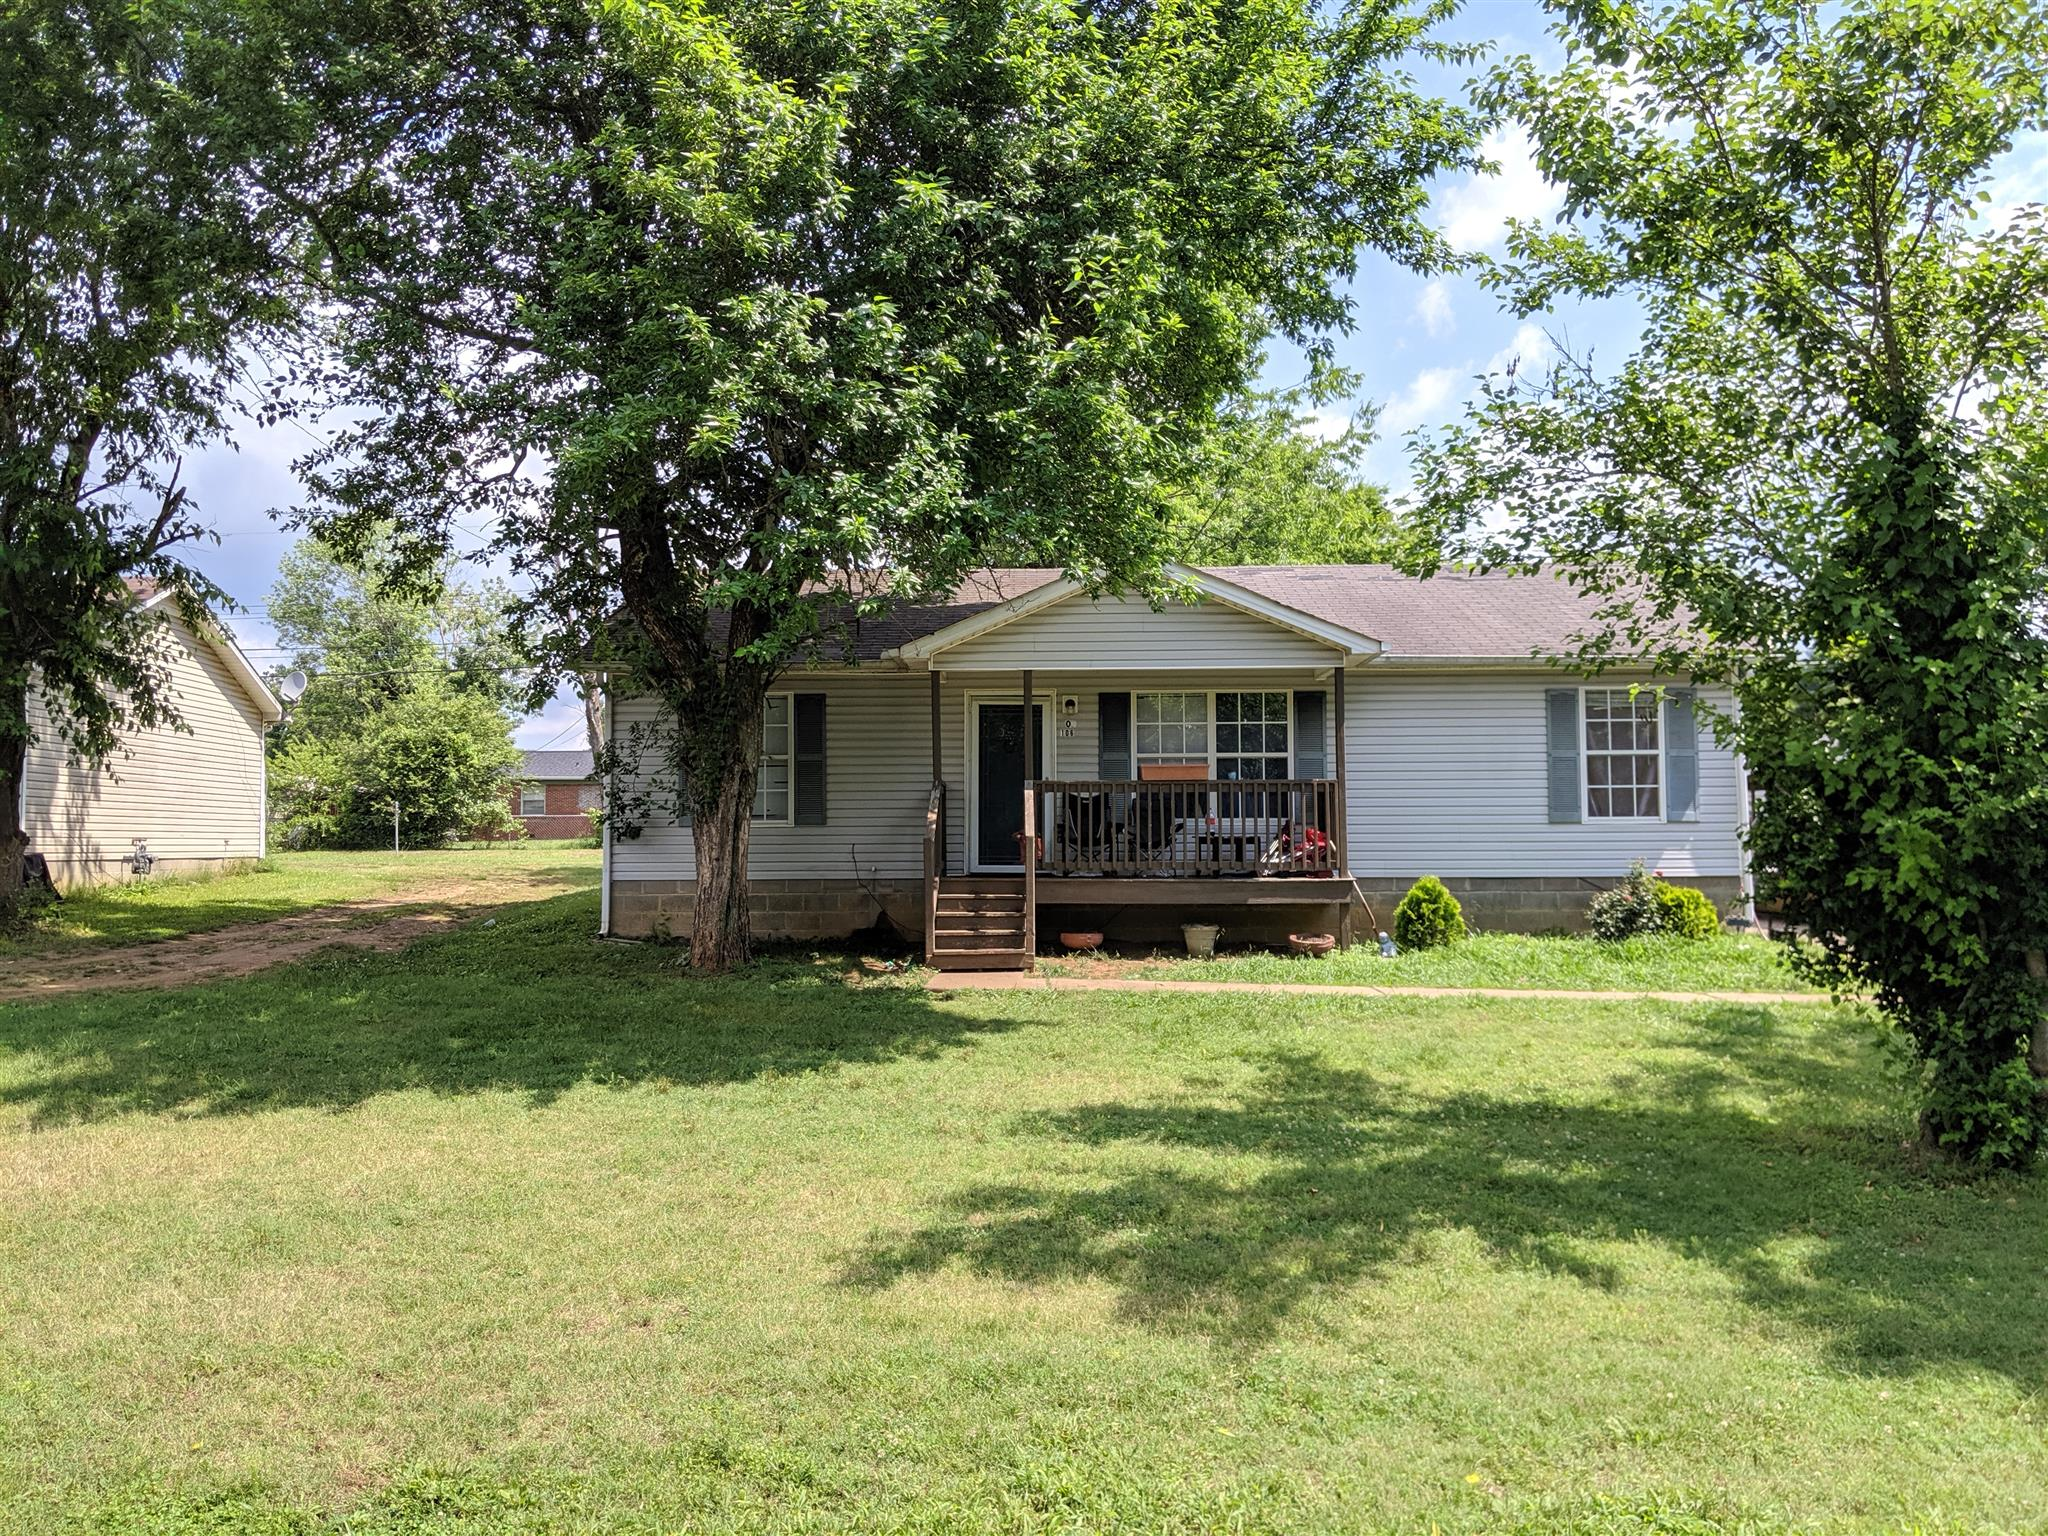 106 Clinch Dr, Columbia, TN 38401 - Columbia, TN real estate listing